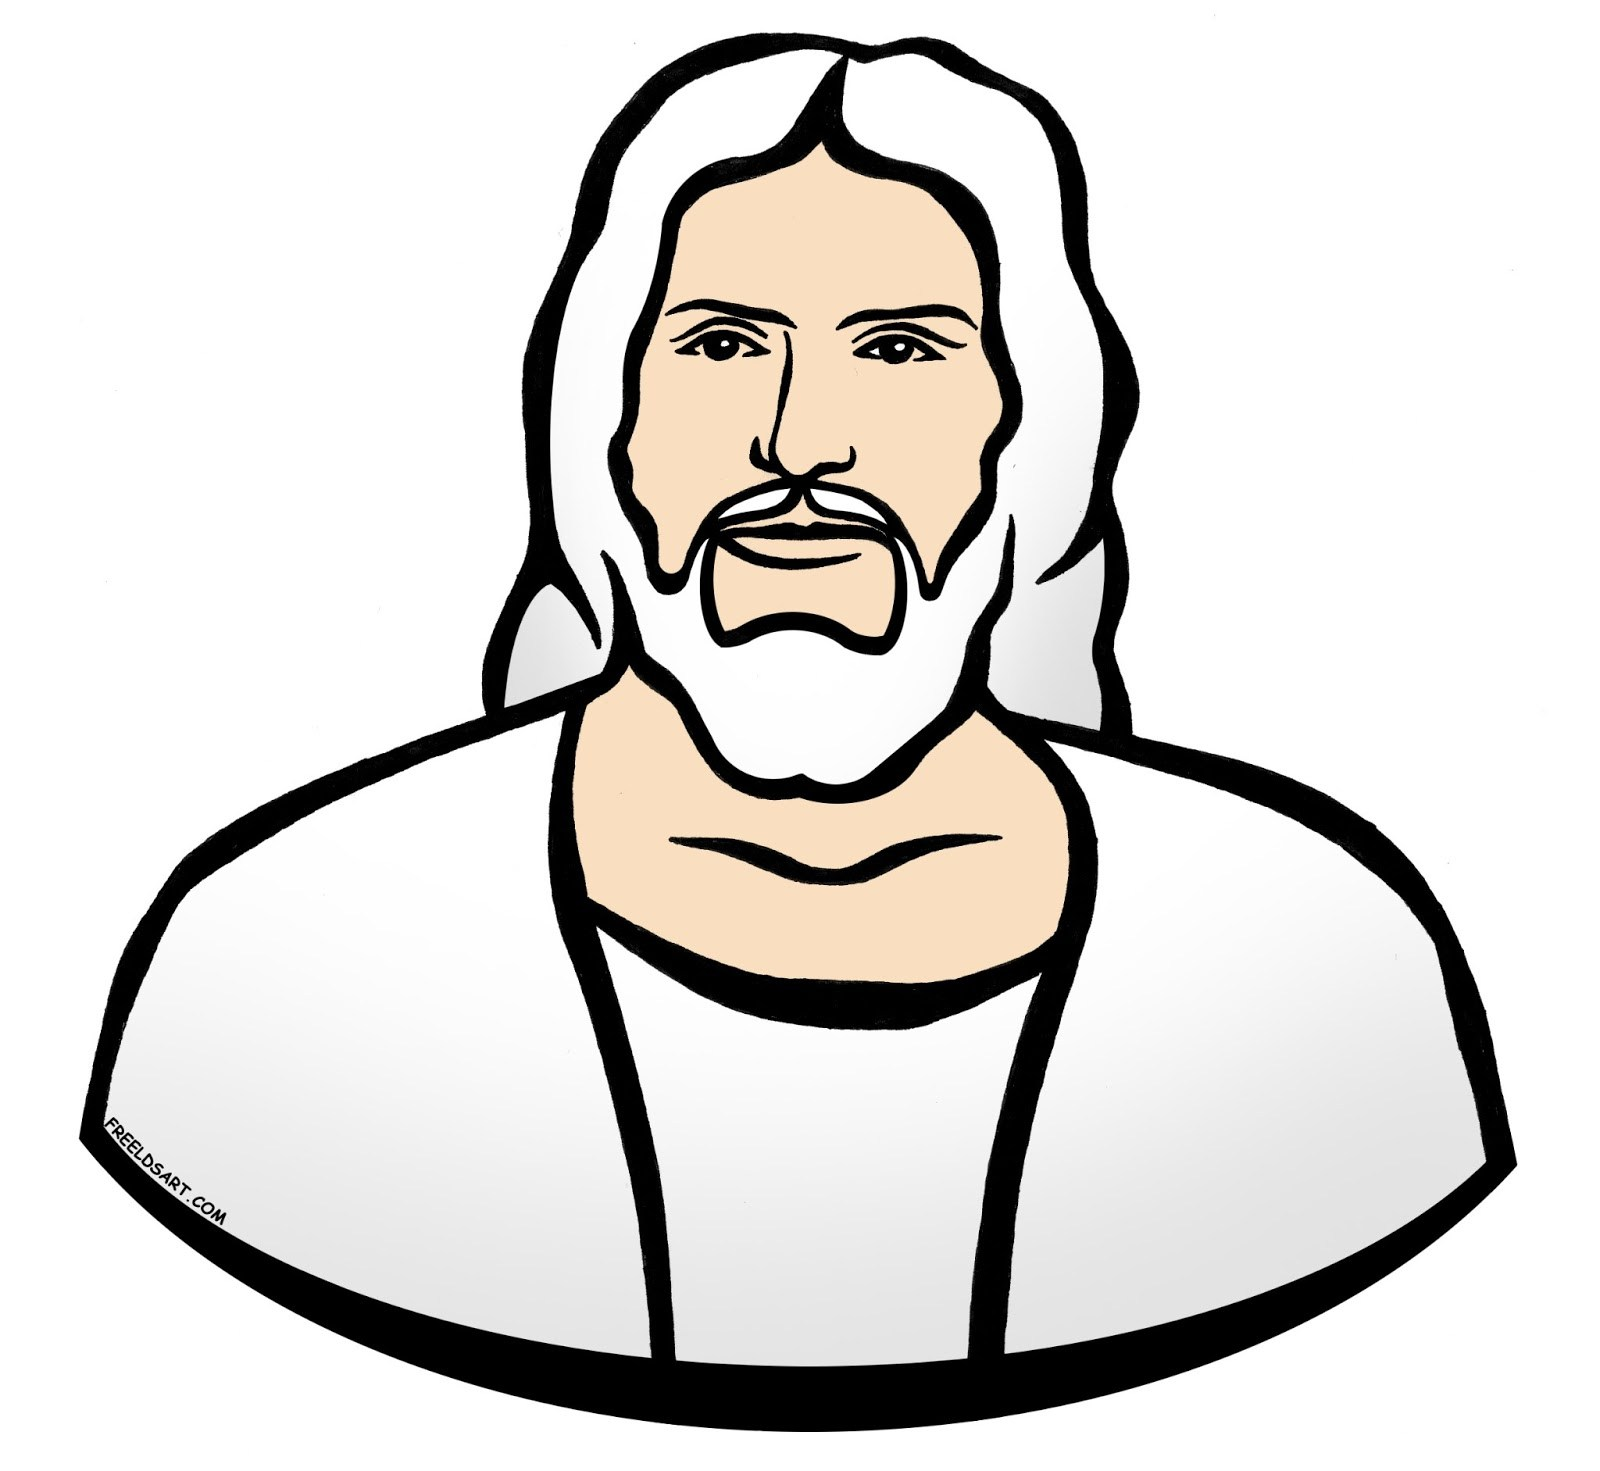 God clipart jpg royalty free God clipart black and white » Clipart Portal jpg royalty free